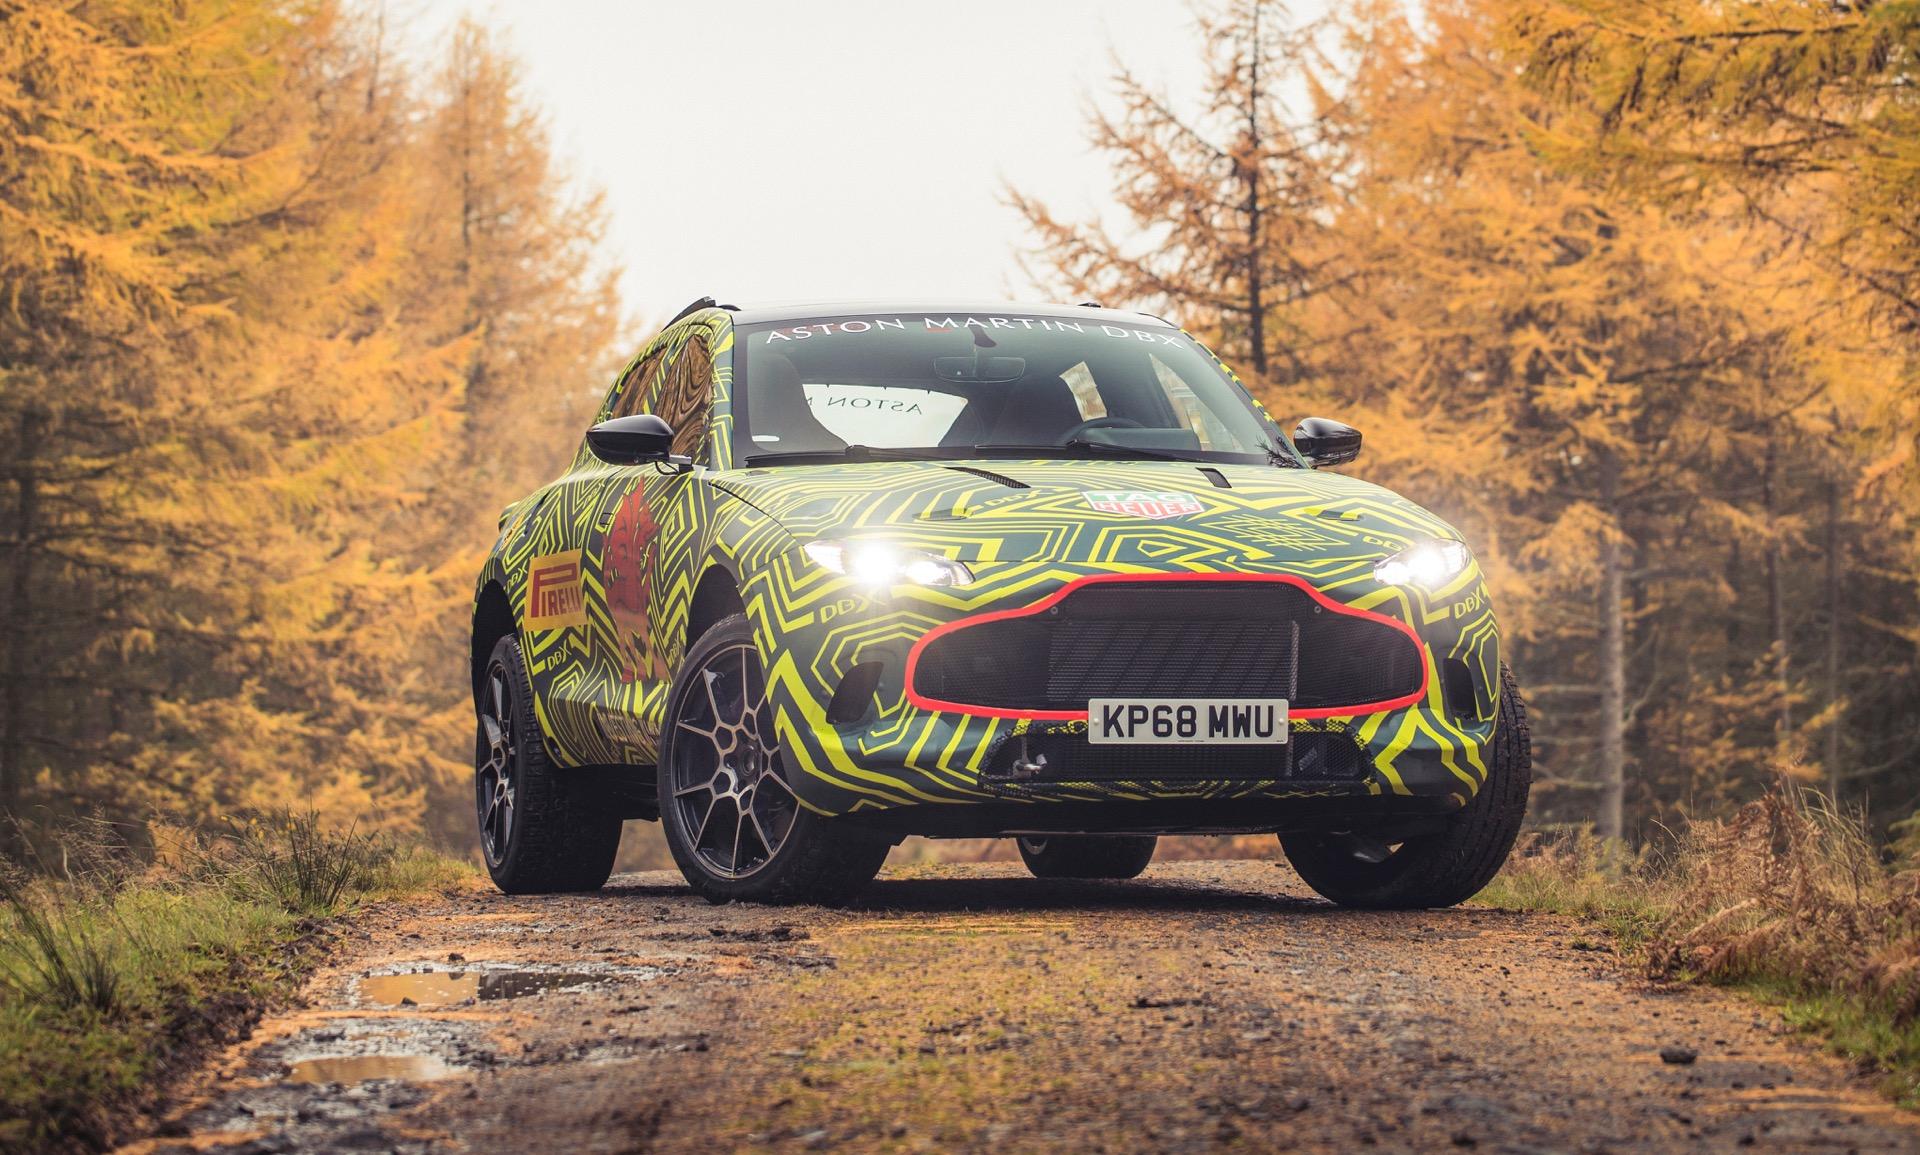 Aston Martin DBX SUV Begins Testing Ahead of 2019 Launch